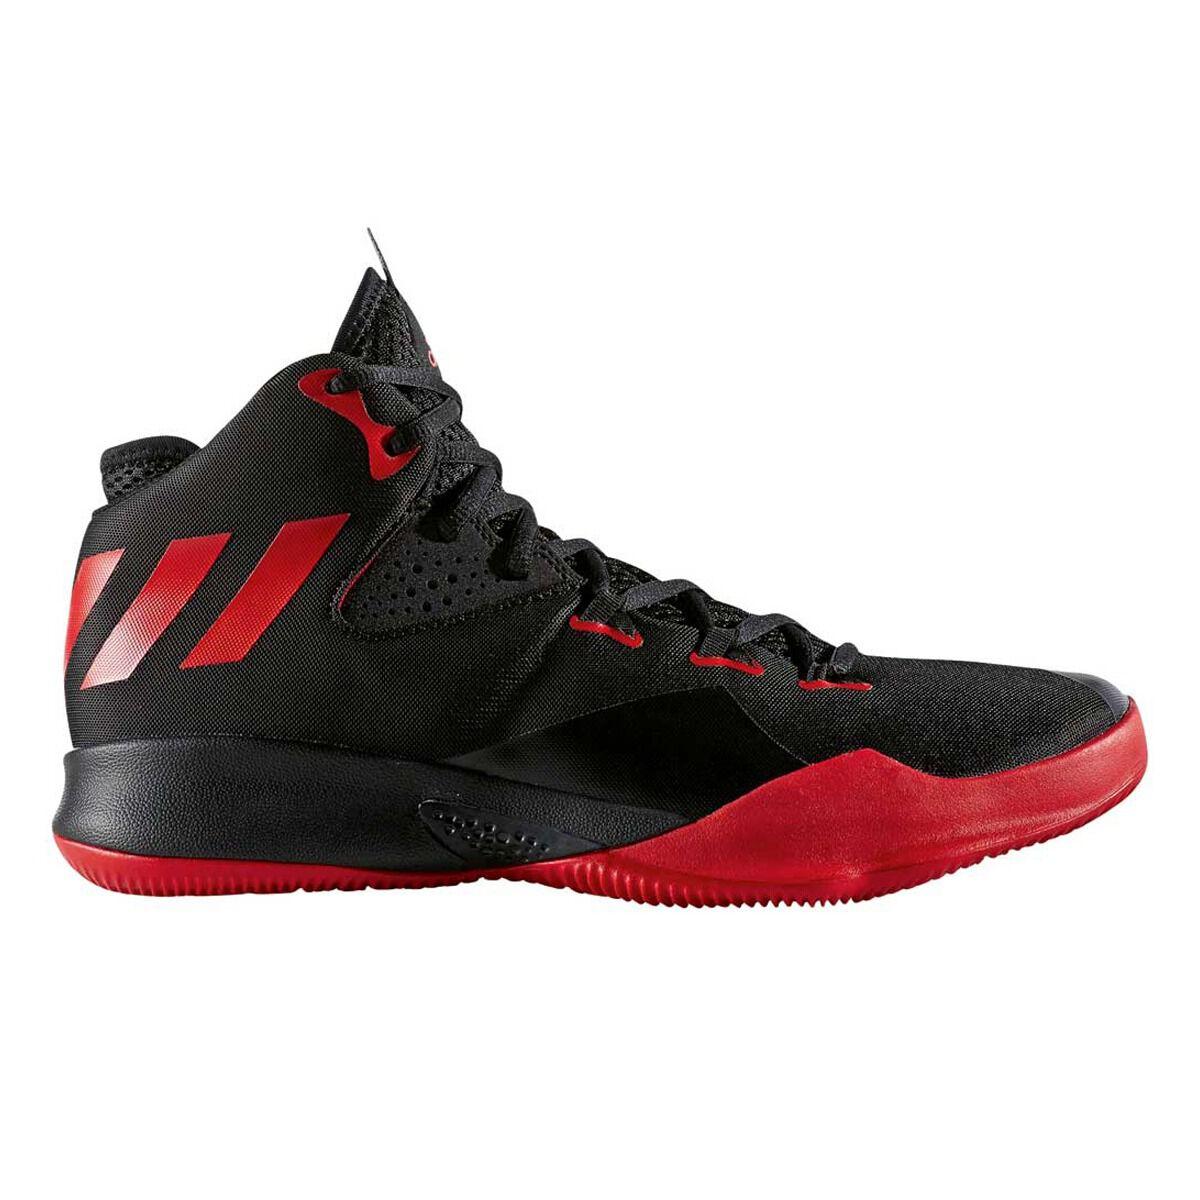 c9f69322d1835f ... promo code adidas dual threat mens basketball shoes red black us 9 red  black b340c c4f3f ...